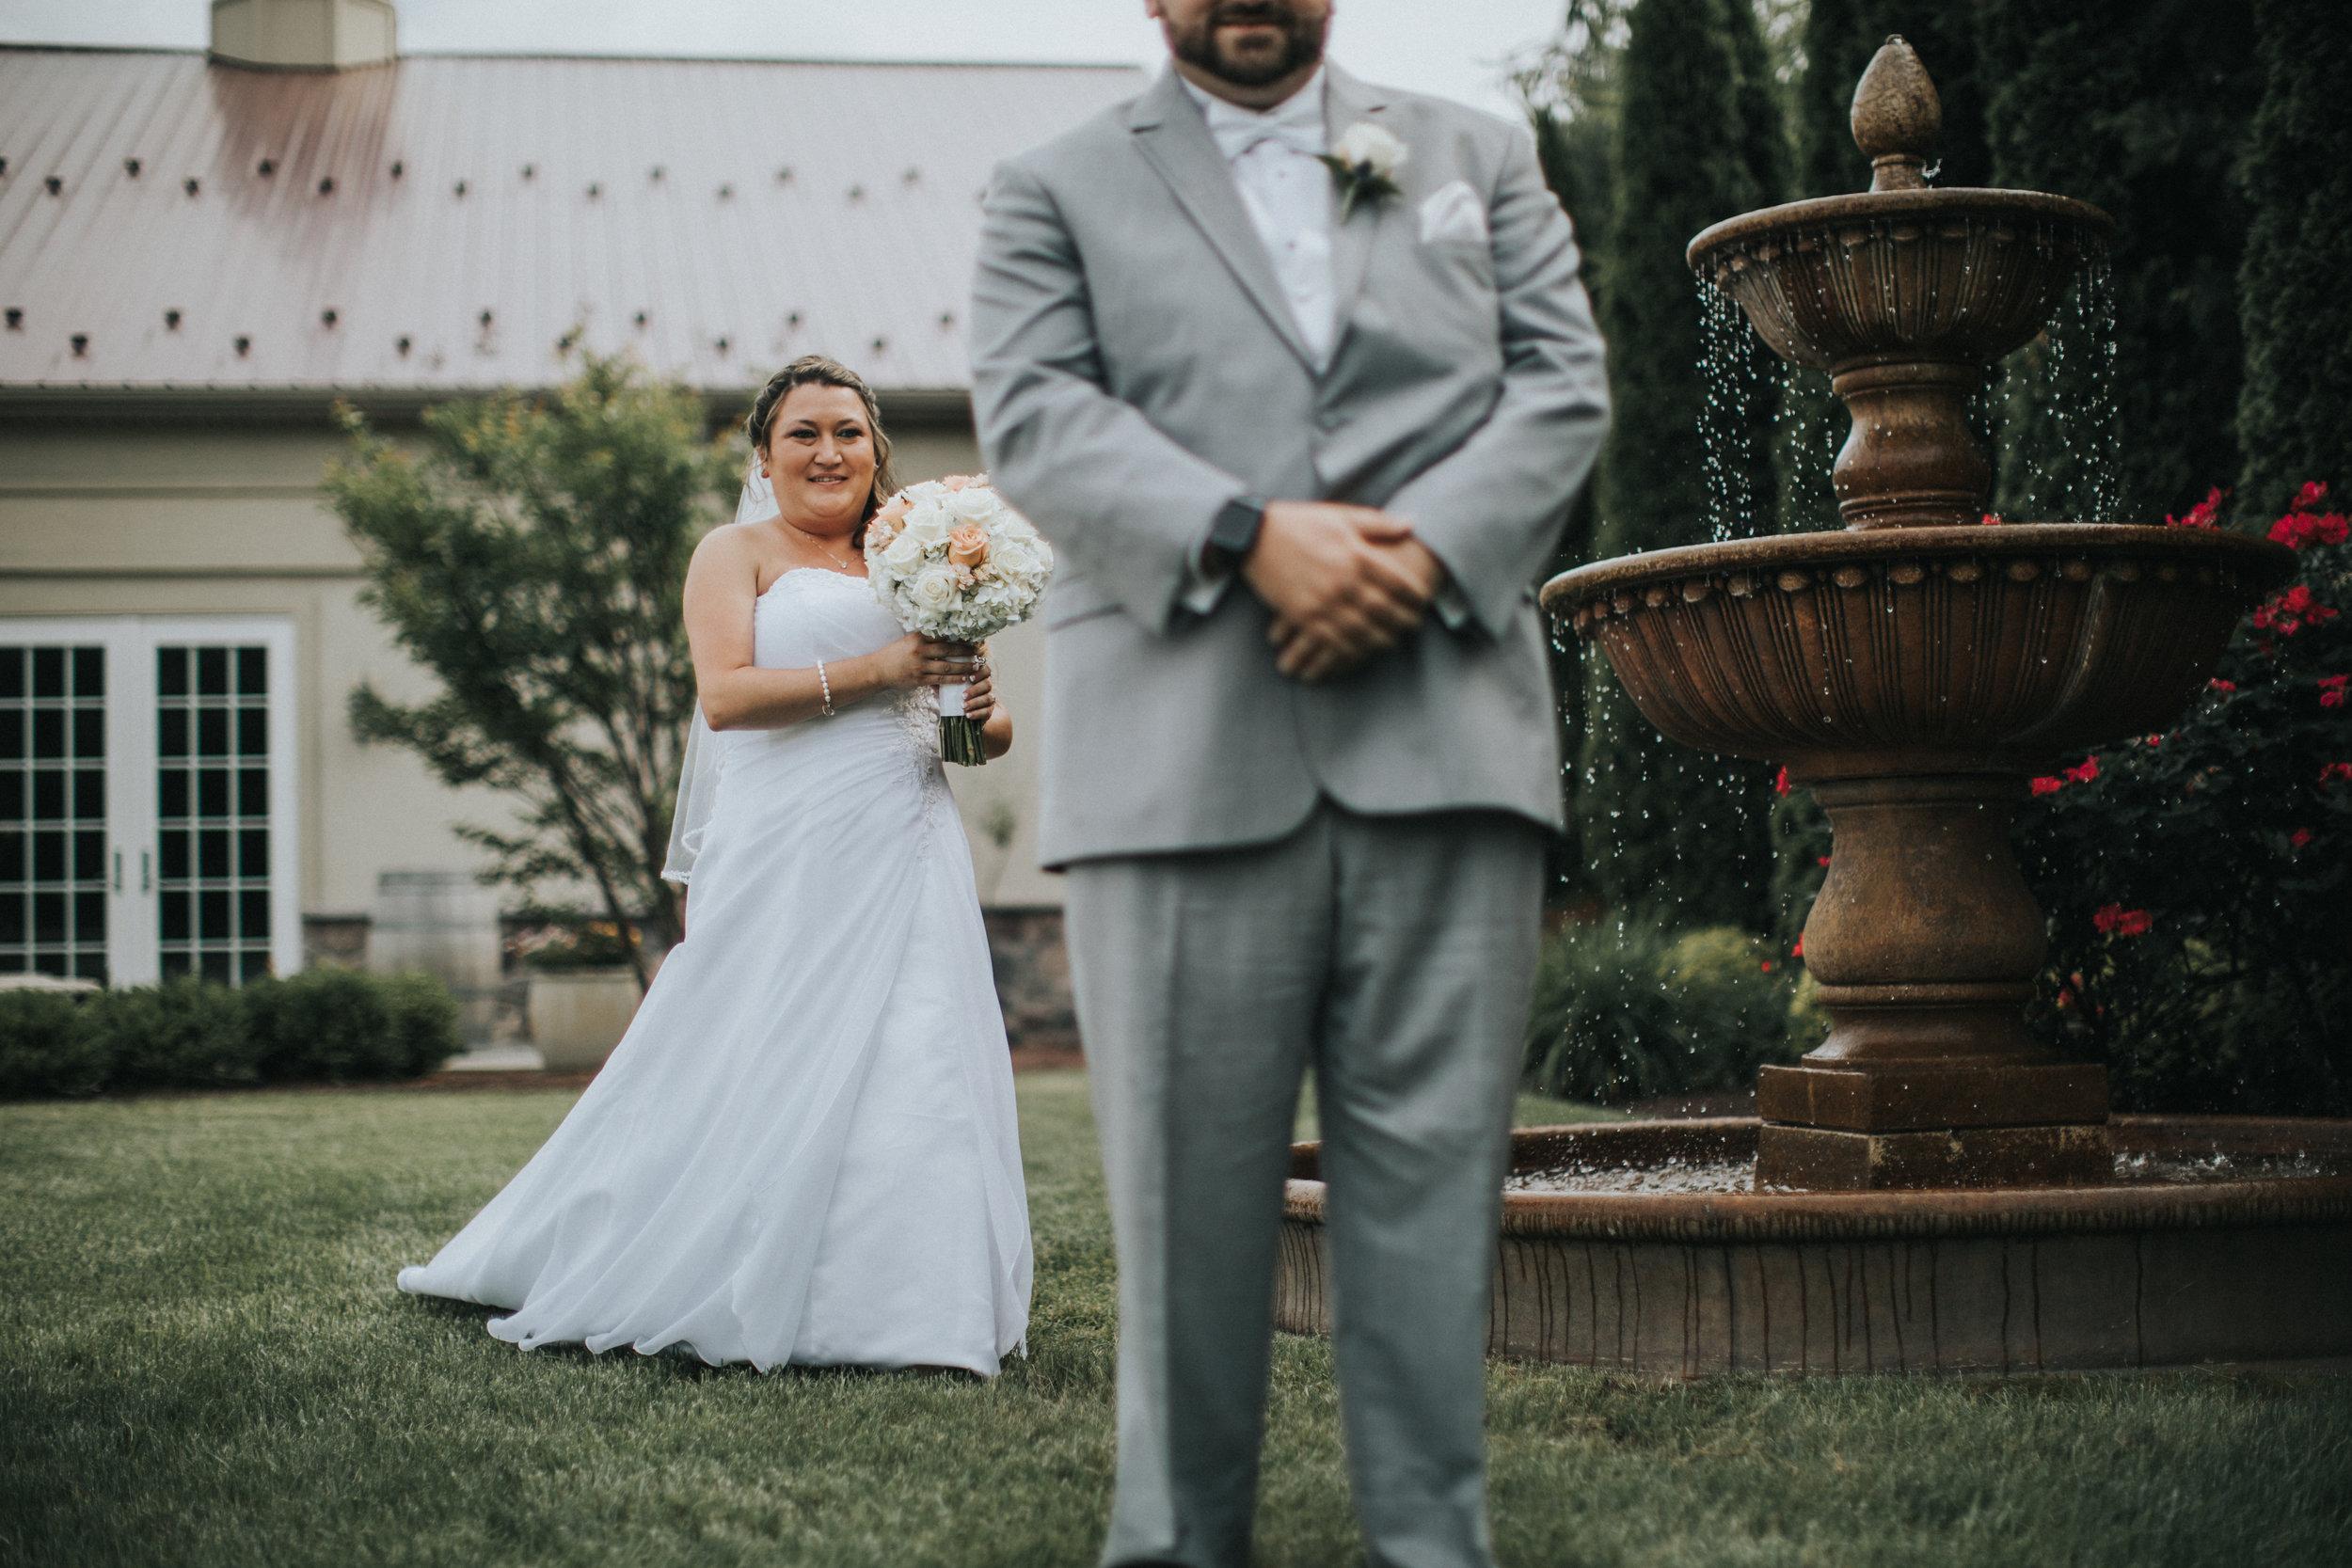 New-Jersey-Wedding-Photographer-JennaLynnPhotography-ValenzanoWinery-FirstLook-29.jpg